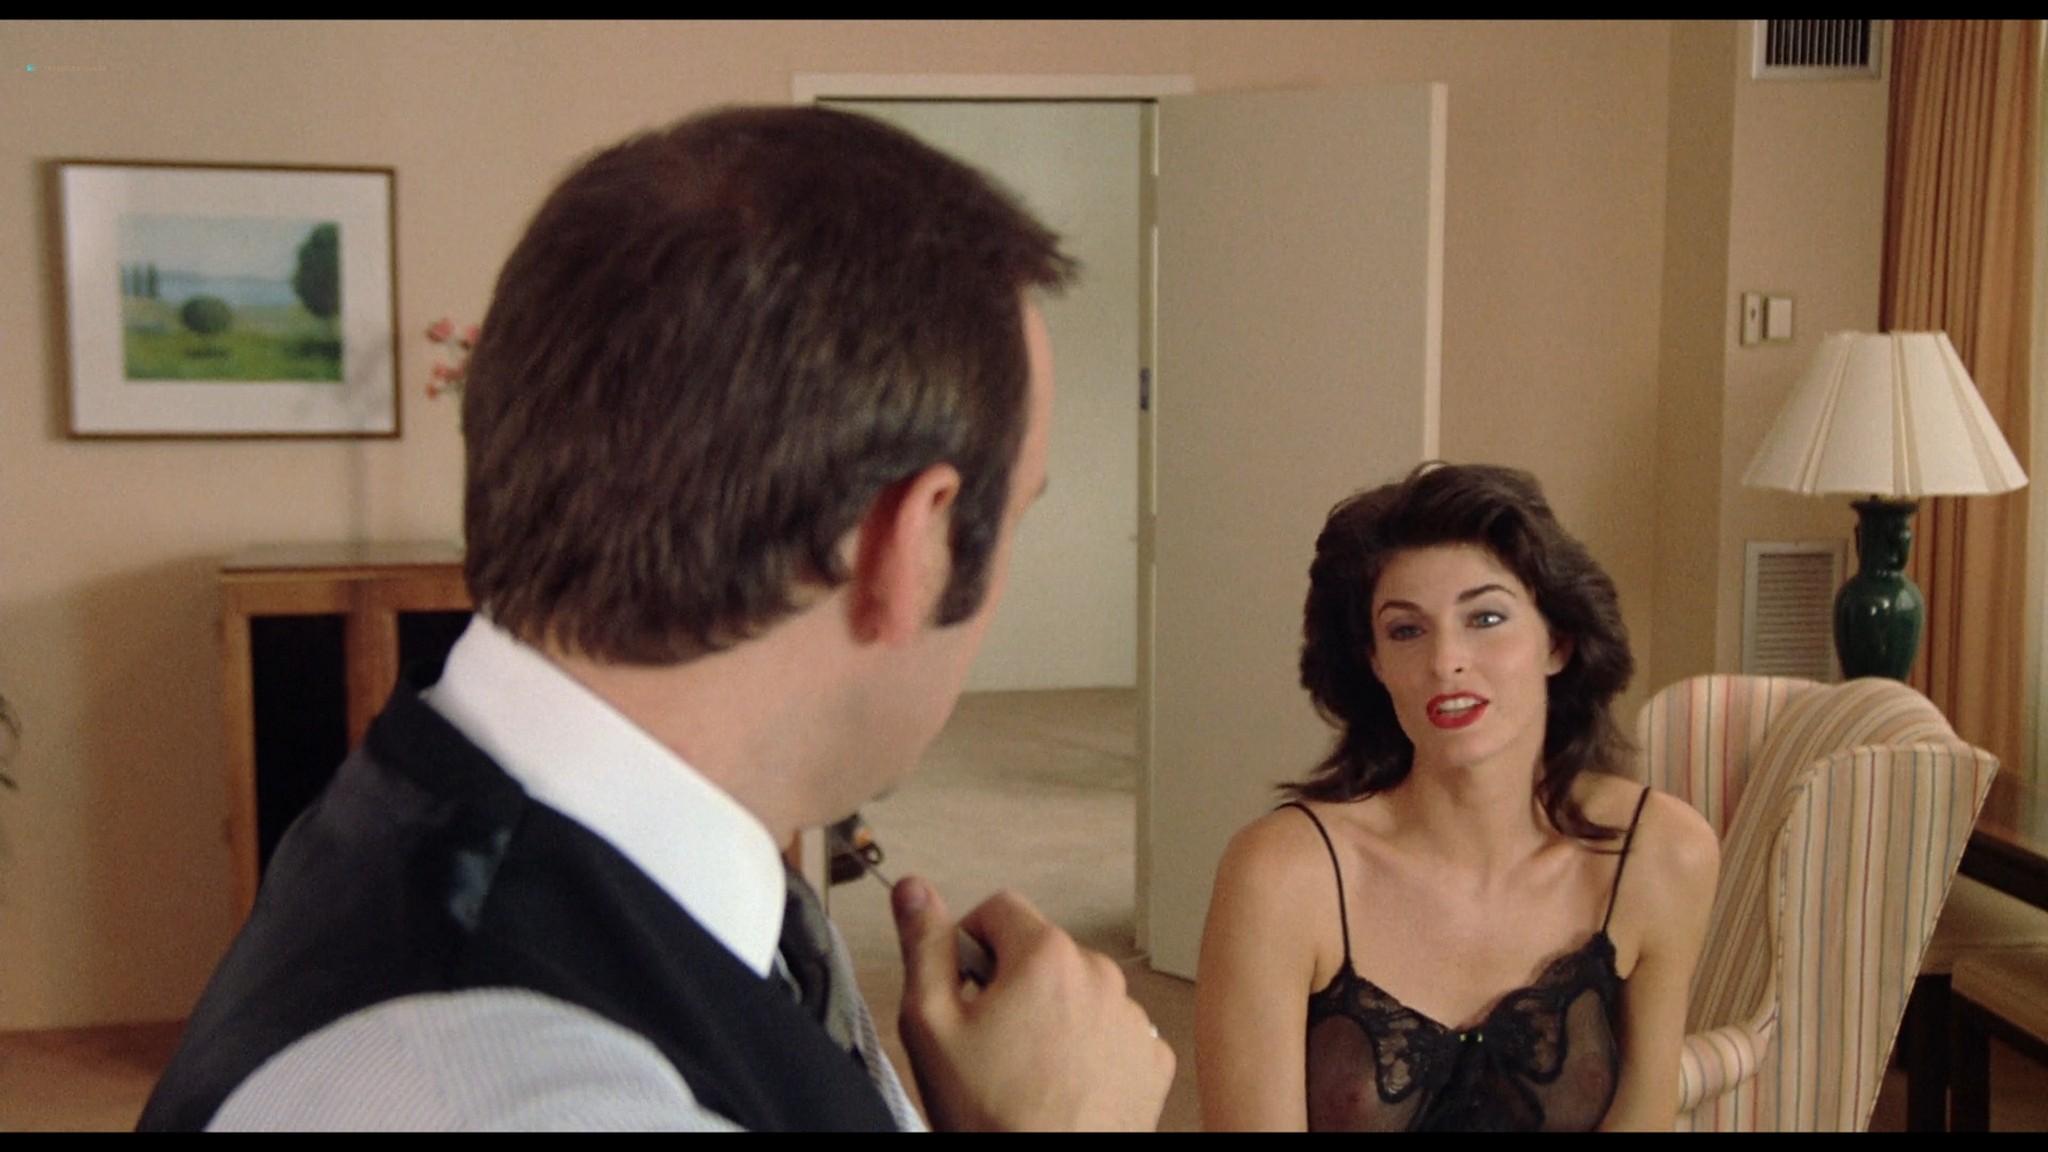 Joan Severance nude topless - See No Evil Hear No Evil (1989) HD 720/1080p (11)